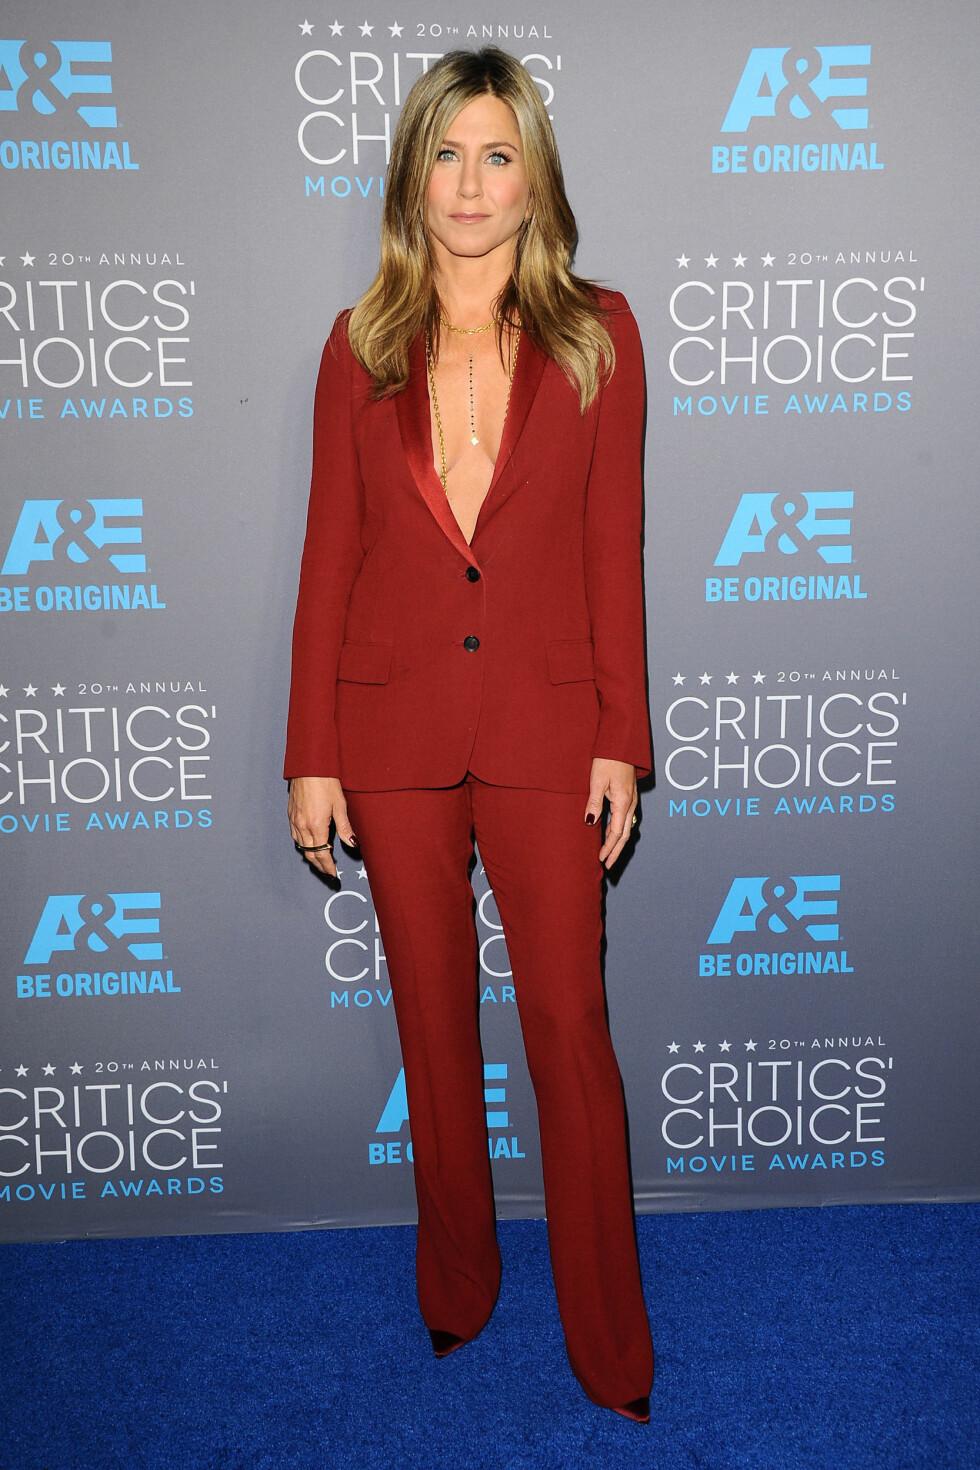 RØDT: Jennifer Aniston valgte en rød dress og droppet skjorten under Annual Critics Choise Awards. Og det funker så bra! Foto: Kyle Rover/startraksphoto.com/Al